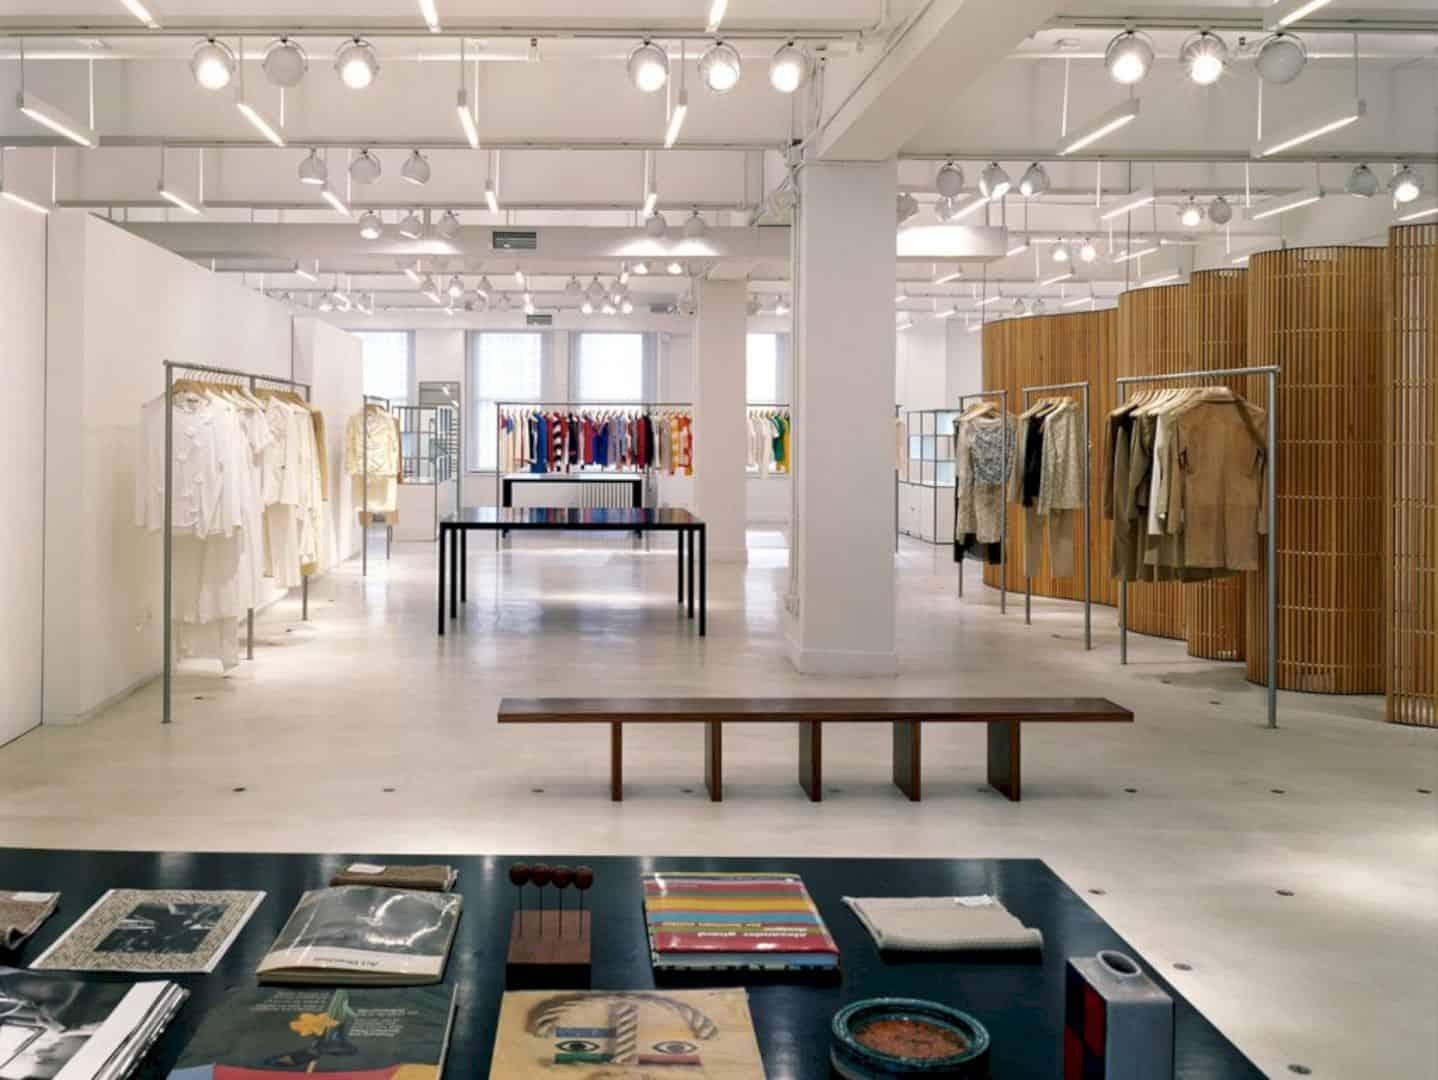 Fashionhaus Showroom A Warehouse Turned Showroom For European Fashion Labels 5